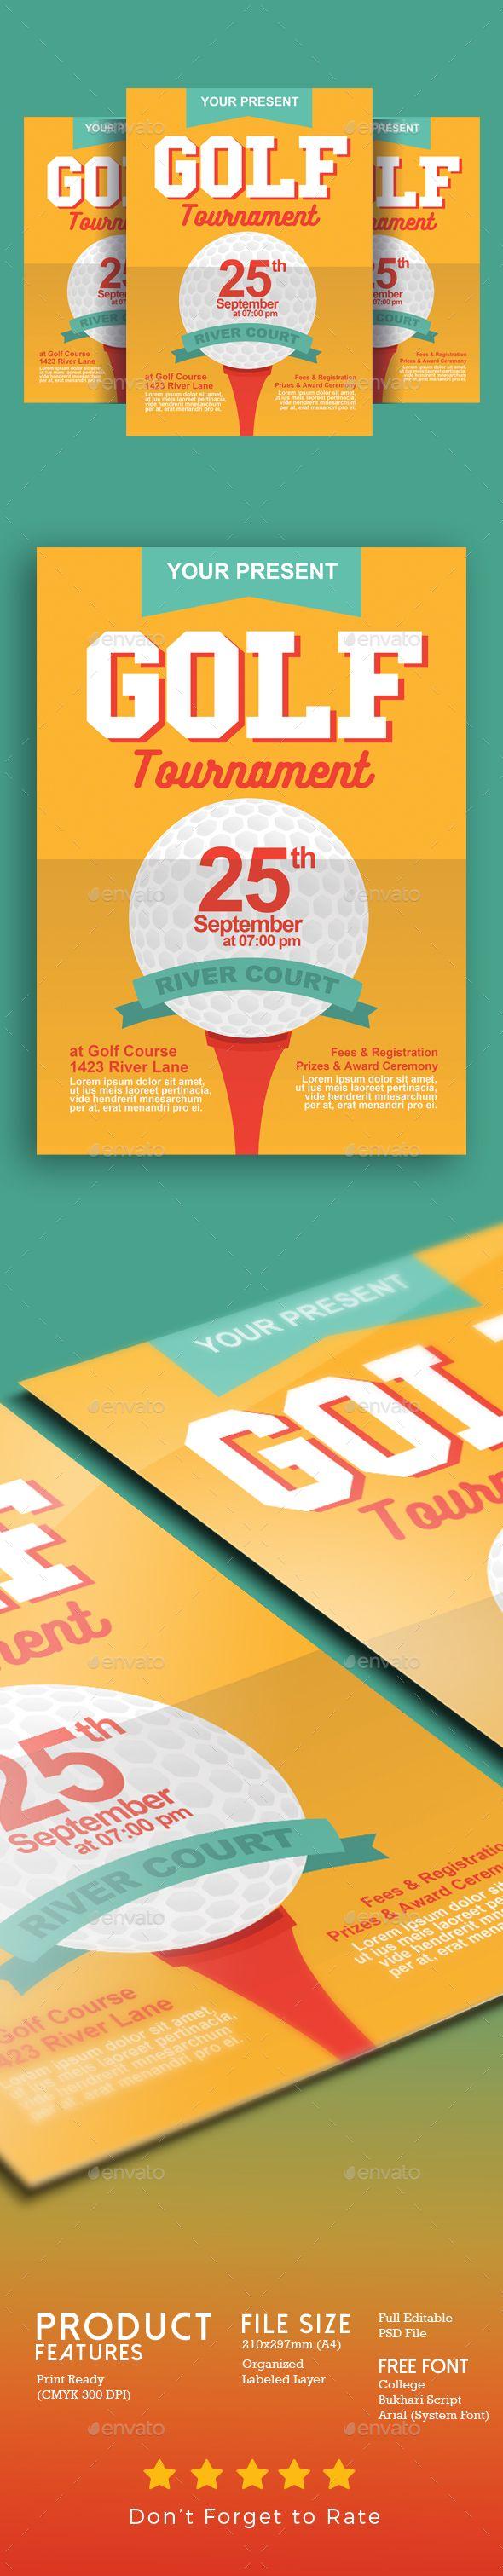 Golf Tournament Flyer Template Golf And Template - Free golf tournament flyer template